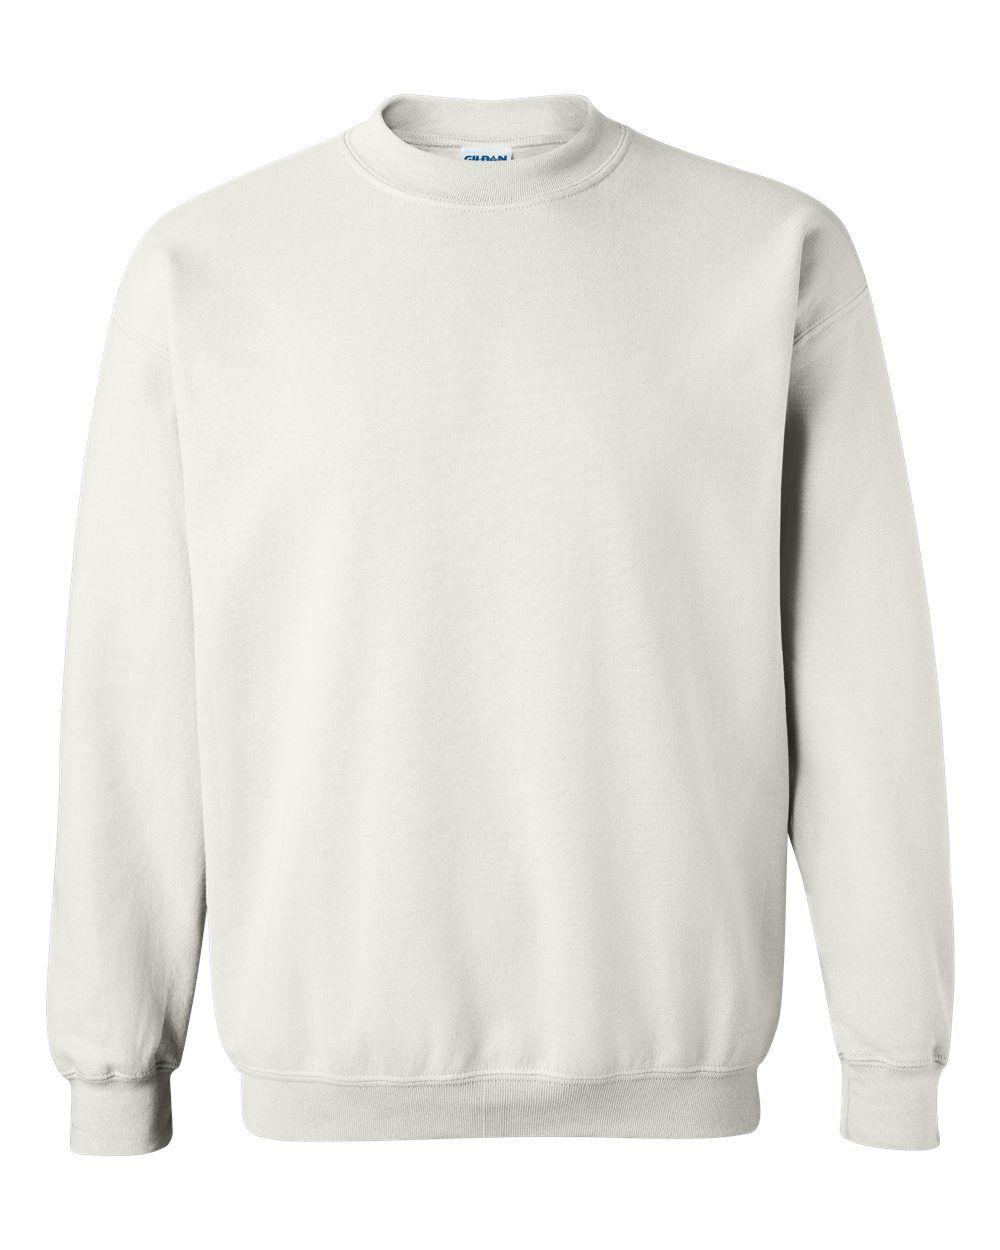 Gildan Heavy Blend Crewneck Sweatshirt 18000 White X Large In 2021 Crew Neck Sweatshirt Sweatshirts Mens Sweatshirts Hoodie [ 1250 x 1000 Pixel ]